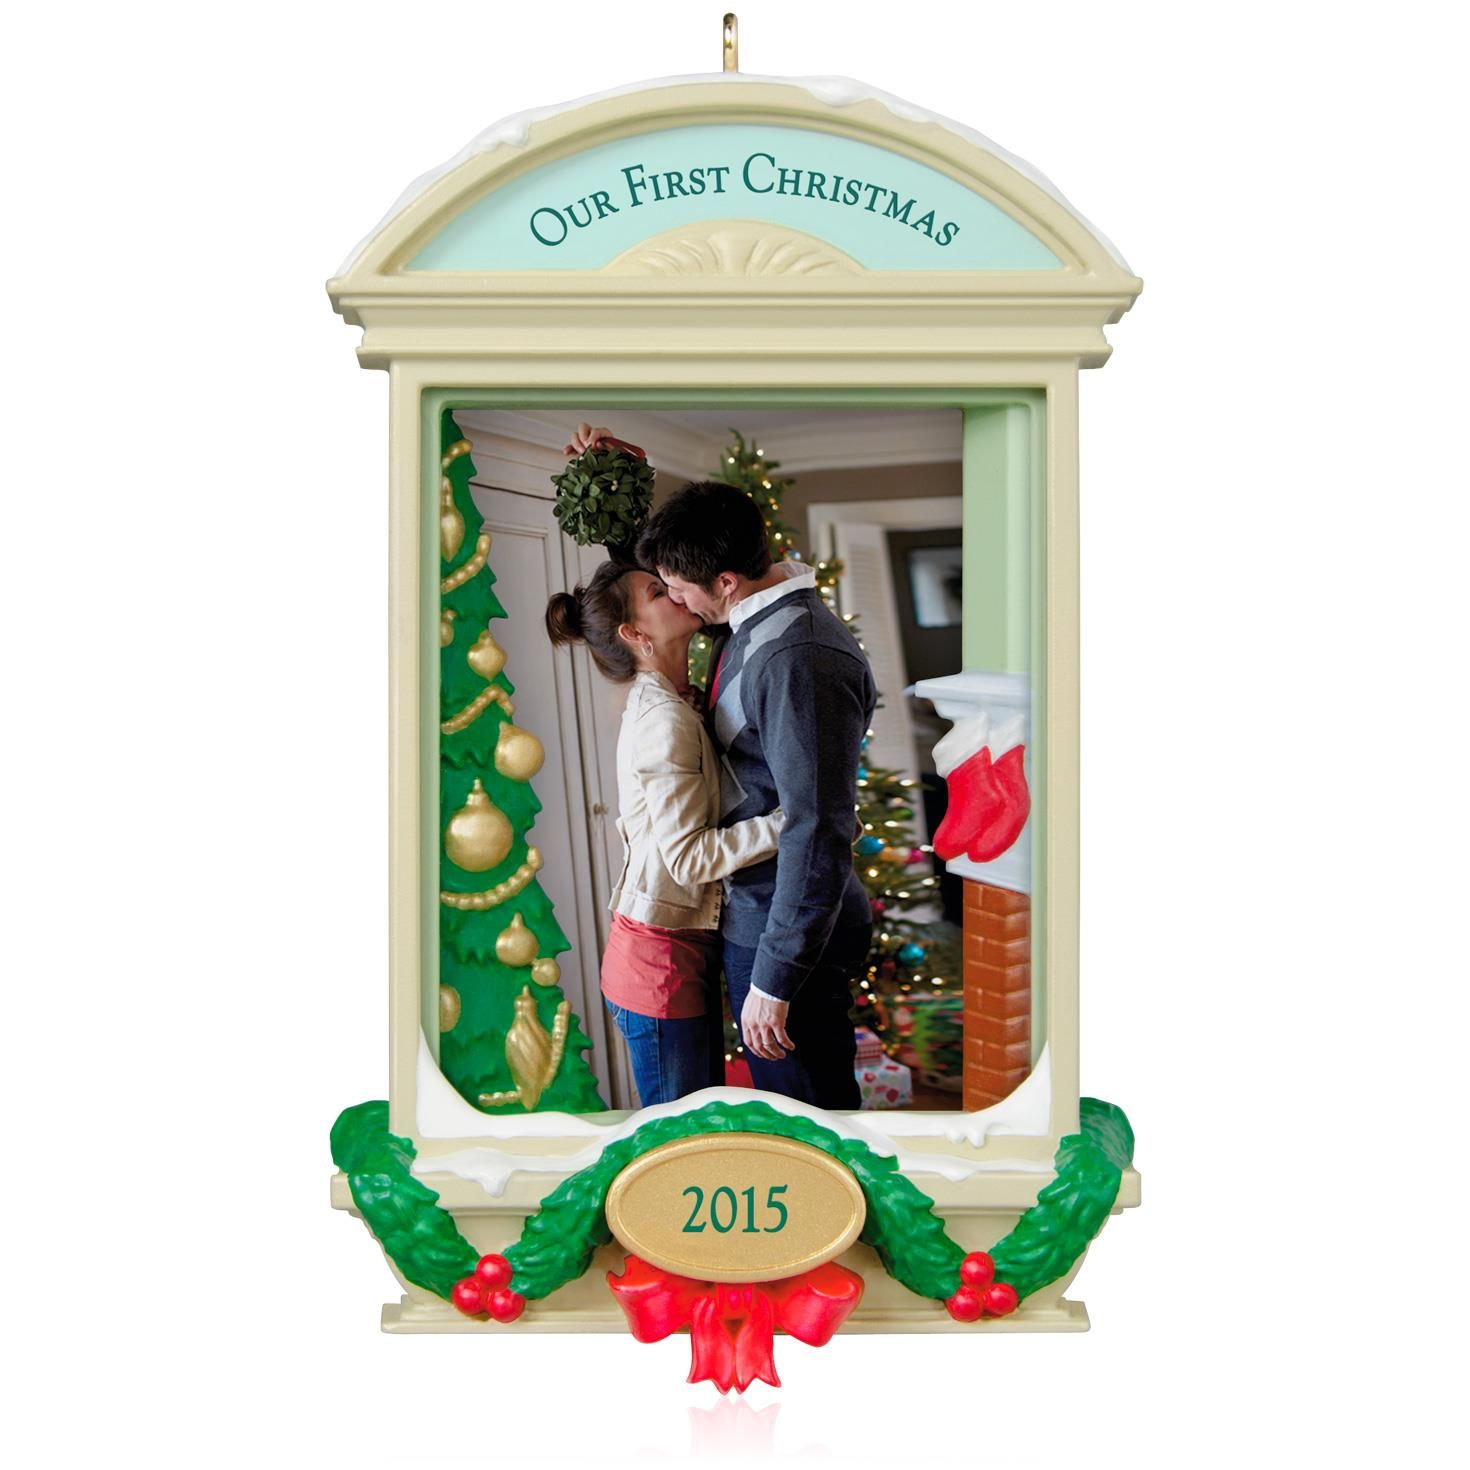 2015 Our First Christmas Together Hallmark Keepsake Ornament - Hooked on Hallmark Ornaments